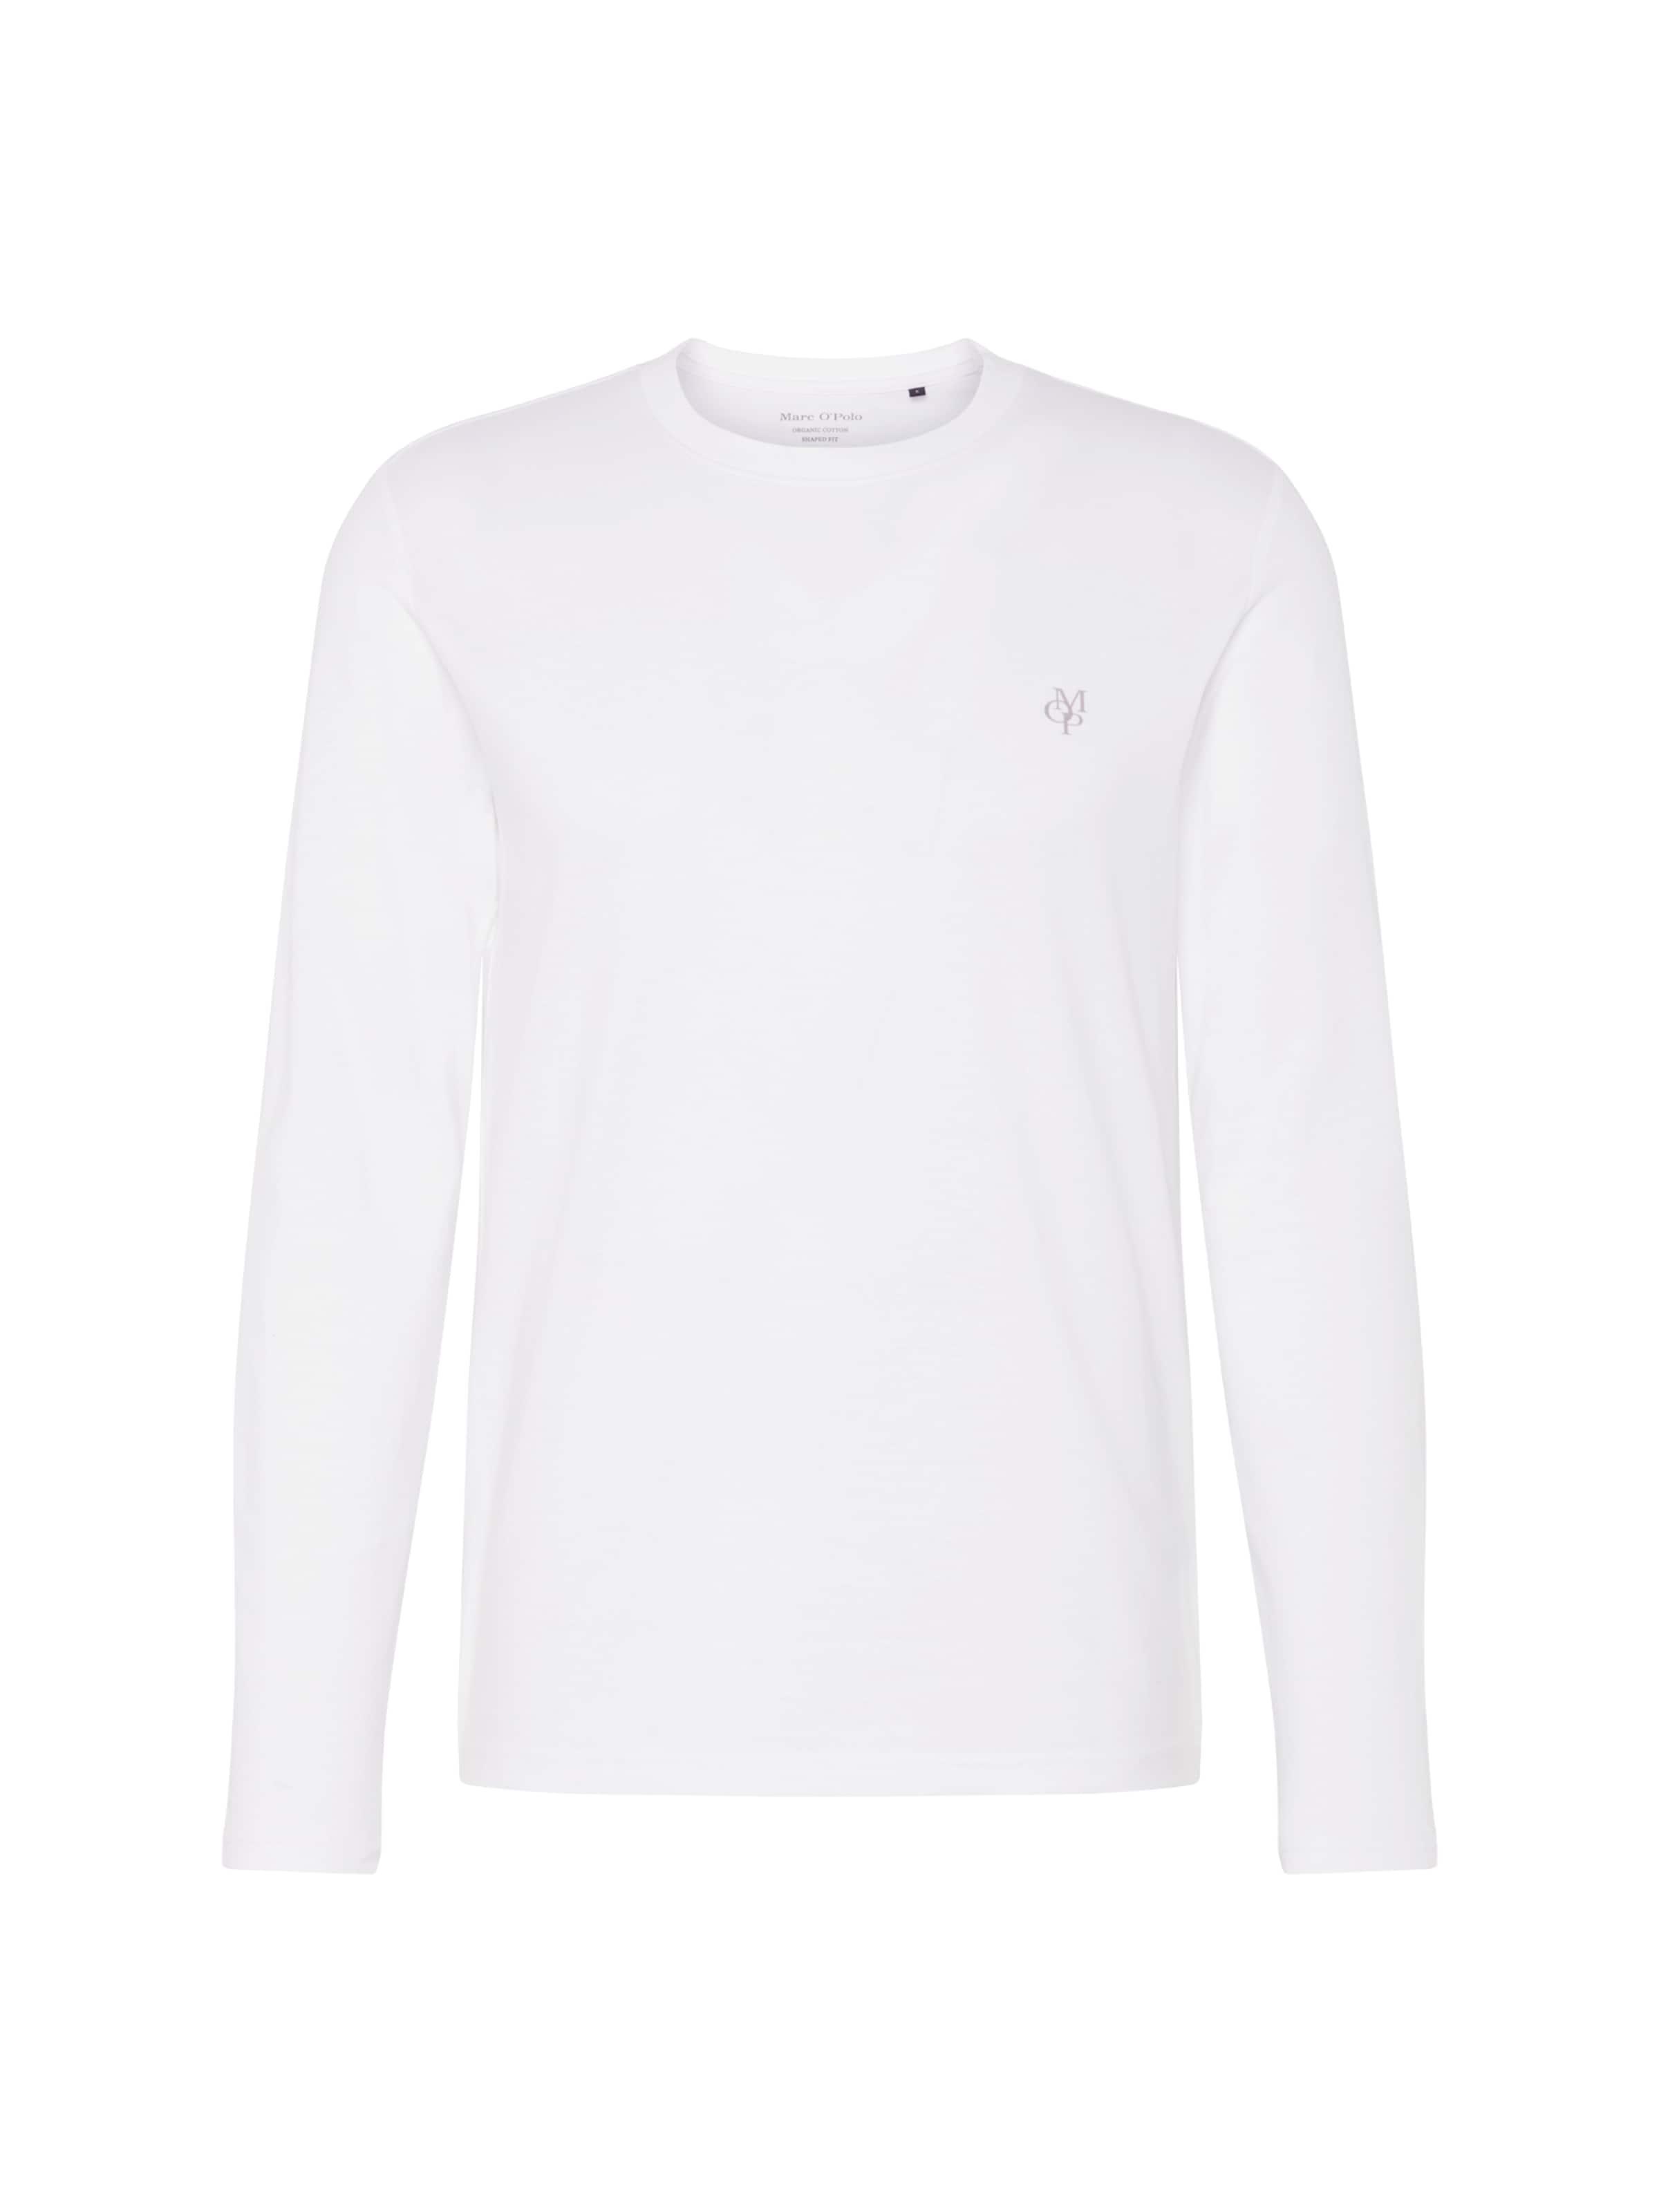 Marc Blanc O'polo En shirt T rwagqr